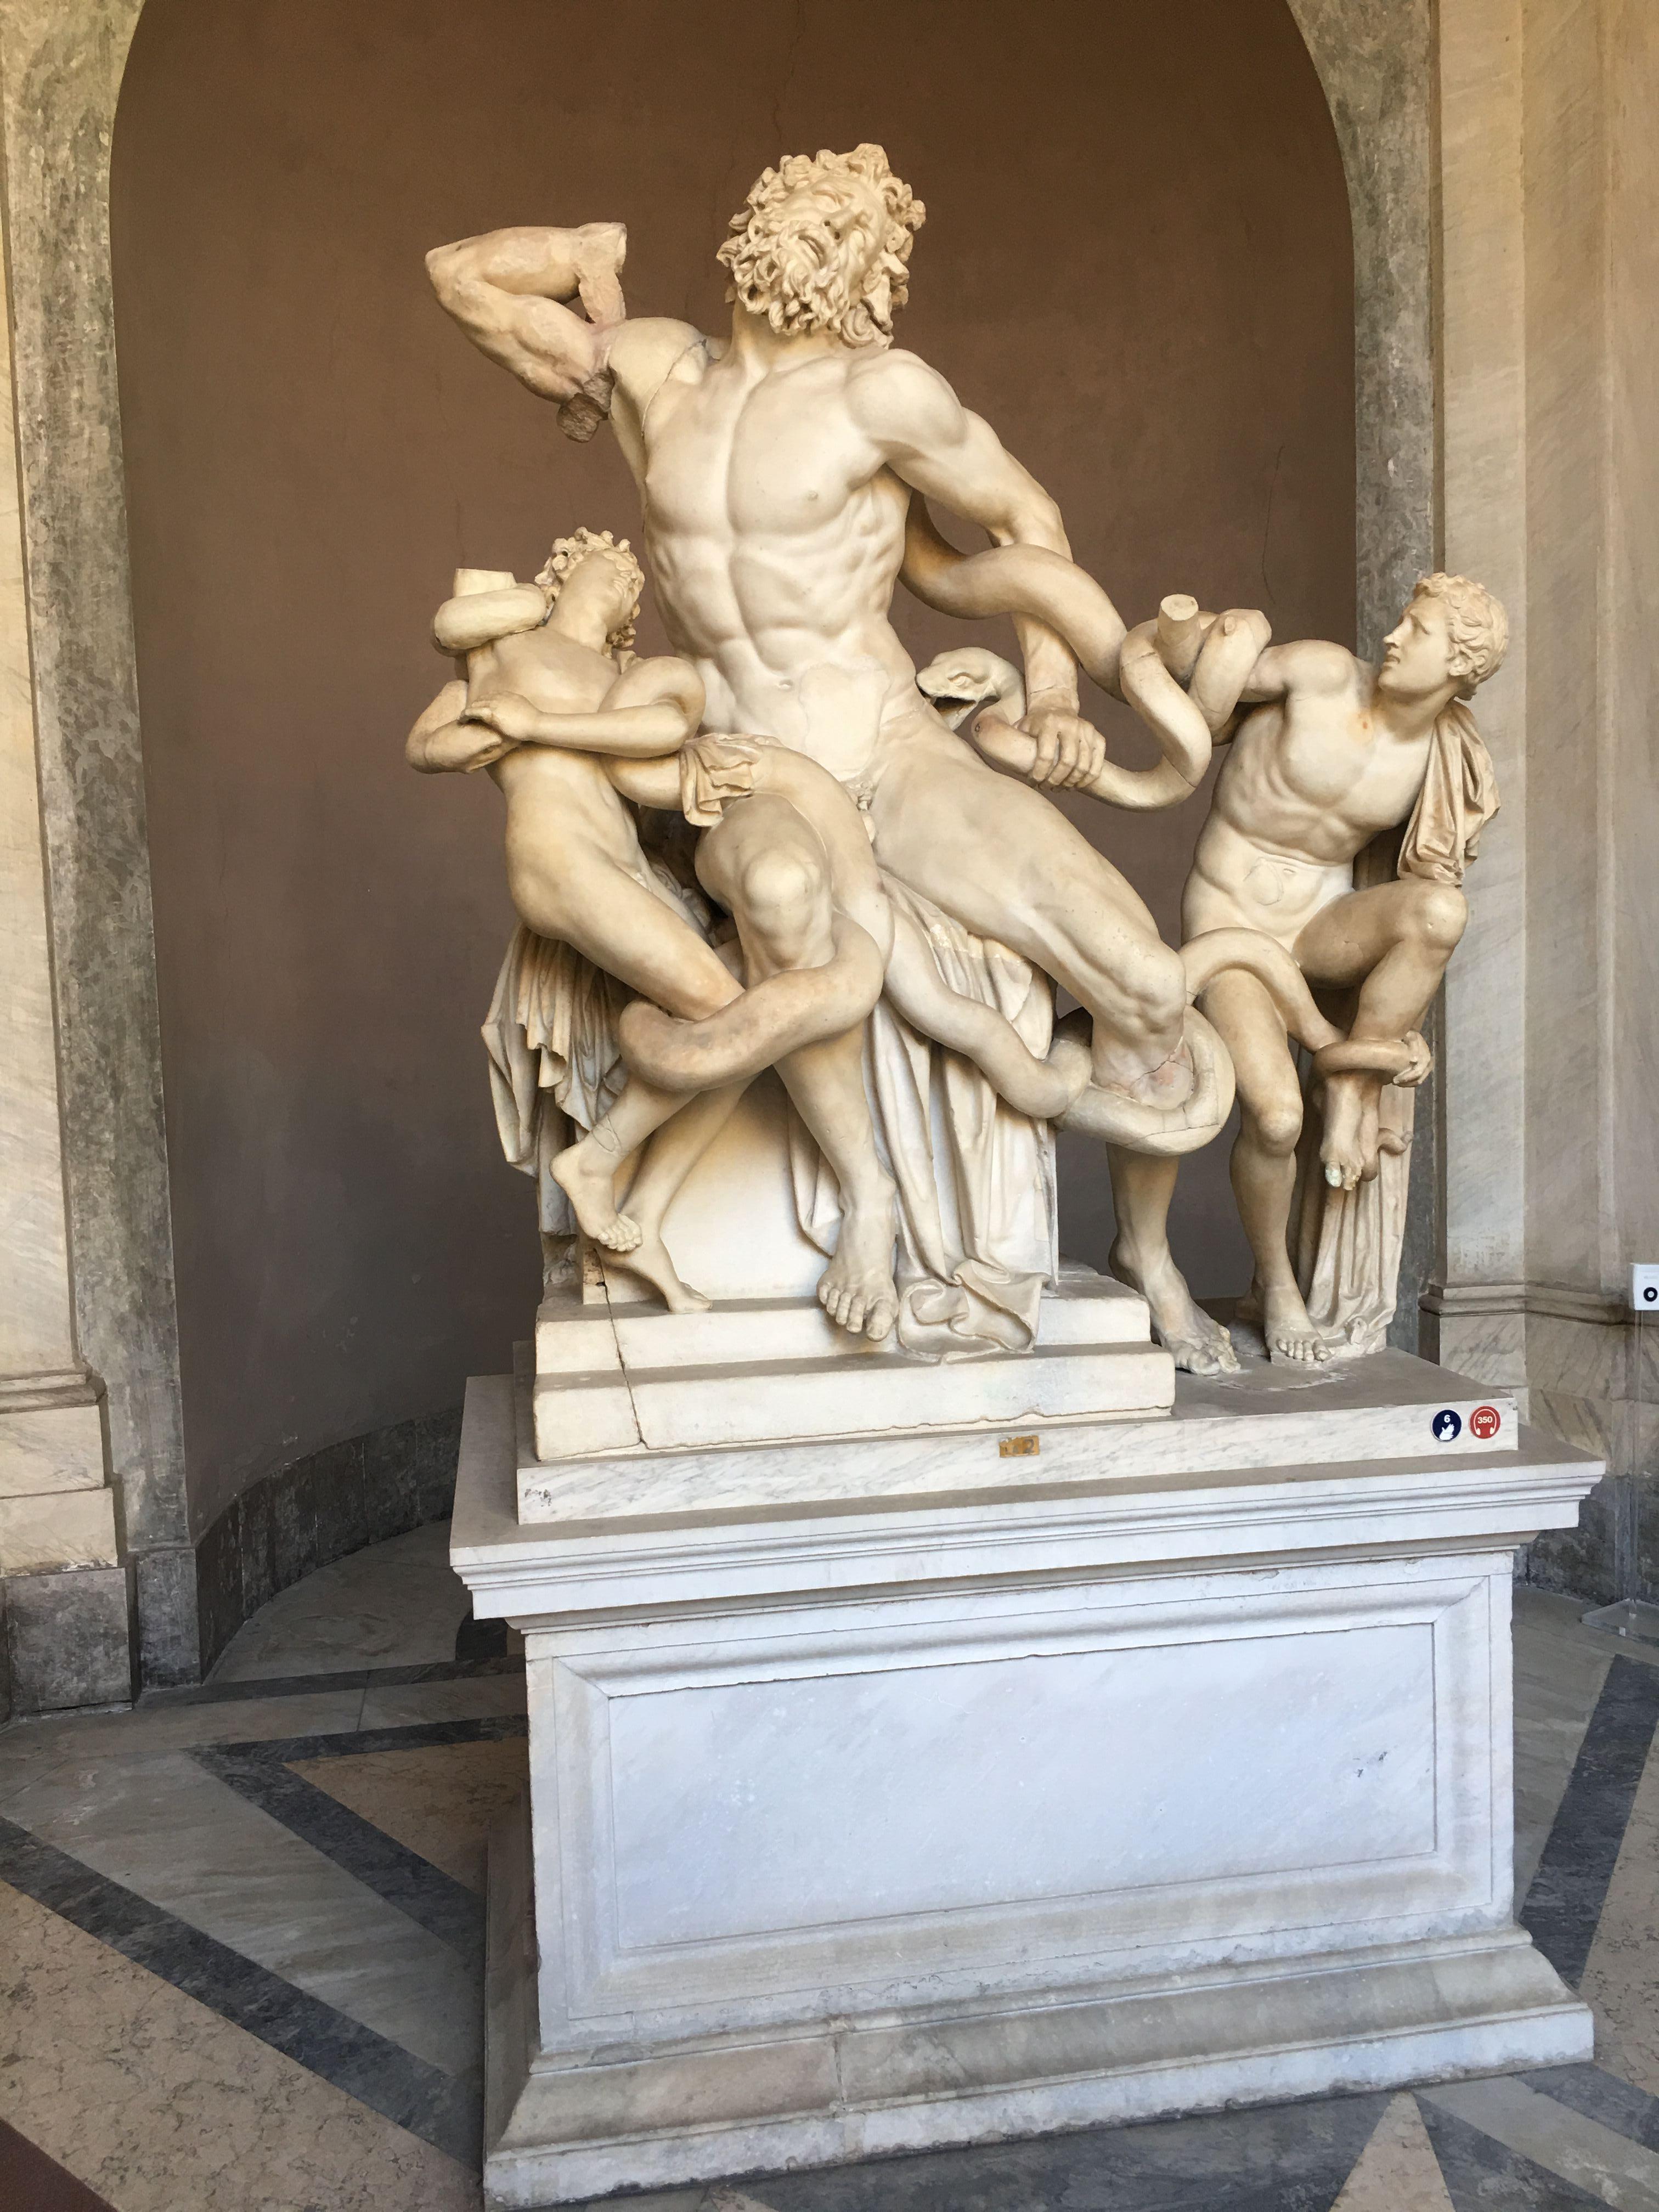 museu-do-vaticano-roma-italia